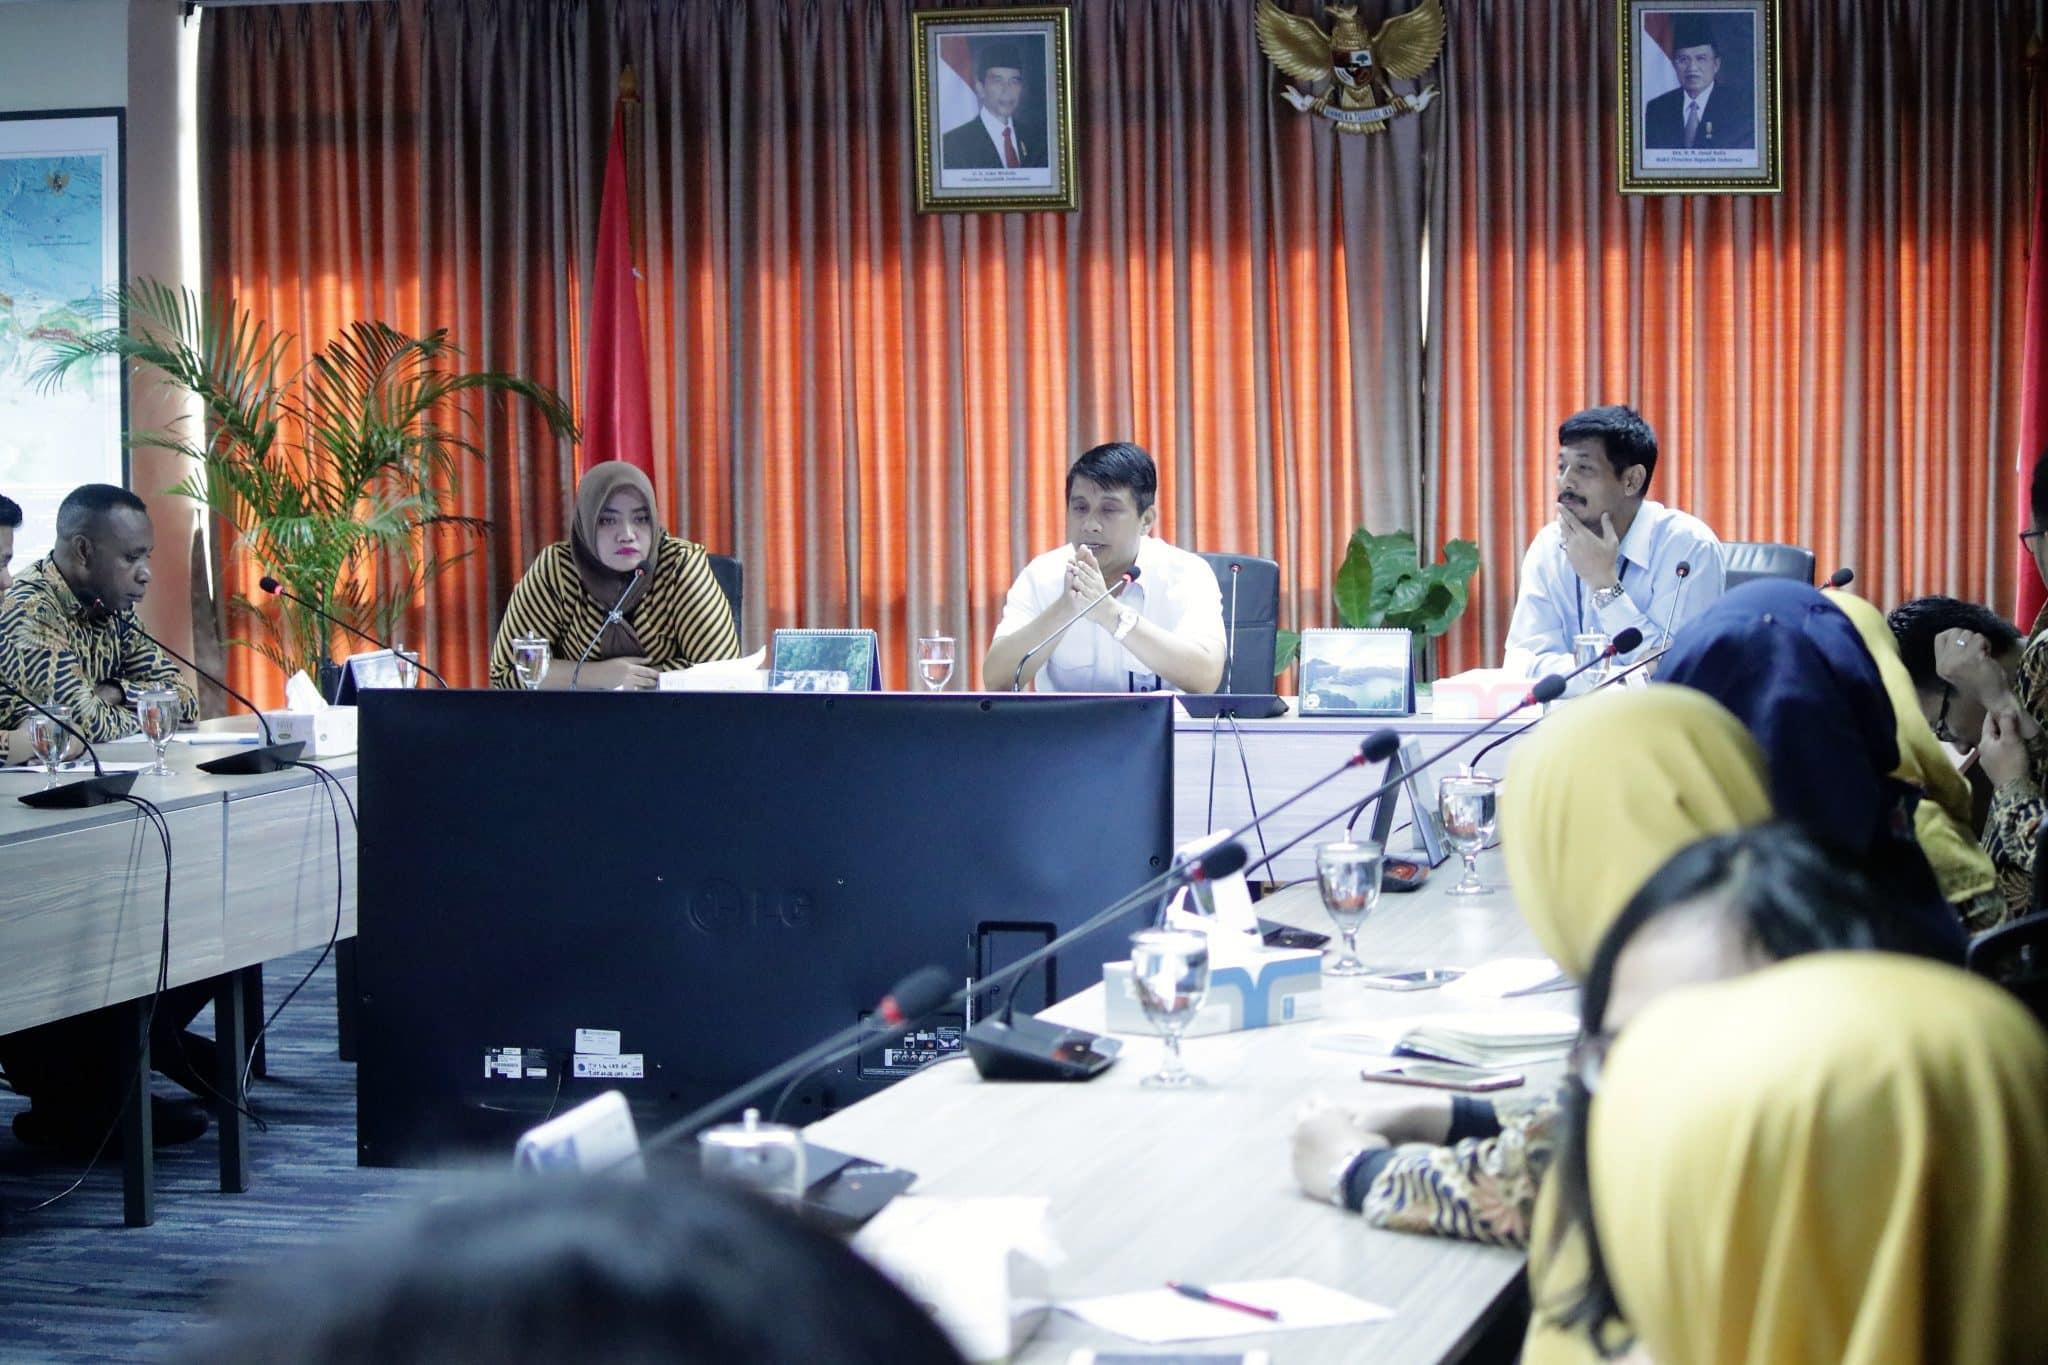 Pembekalan Pendidikan dan Pelatihan Bagi Calon Pegawai Negeri Sipil (CPNS) Kemaritiman